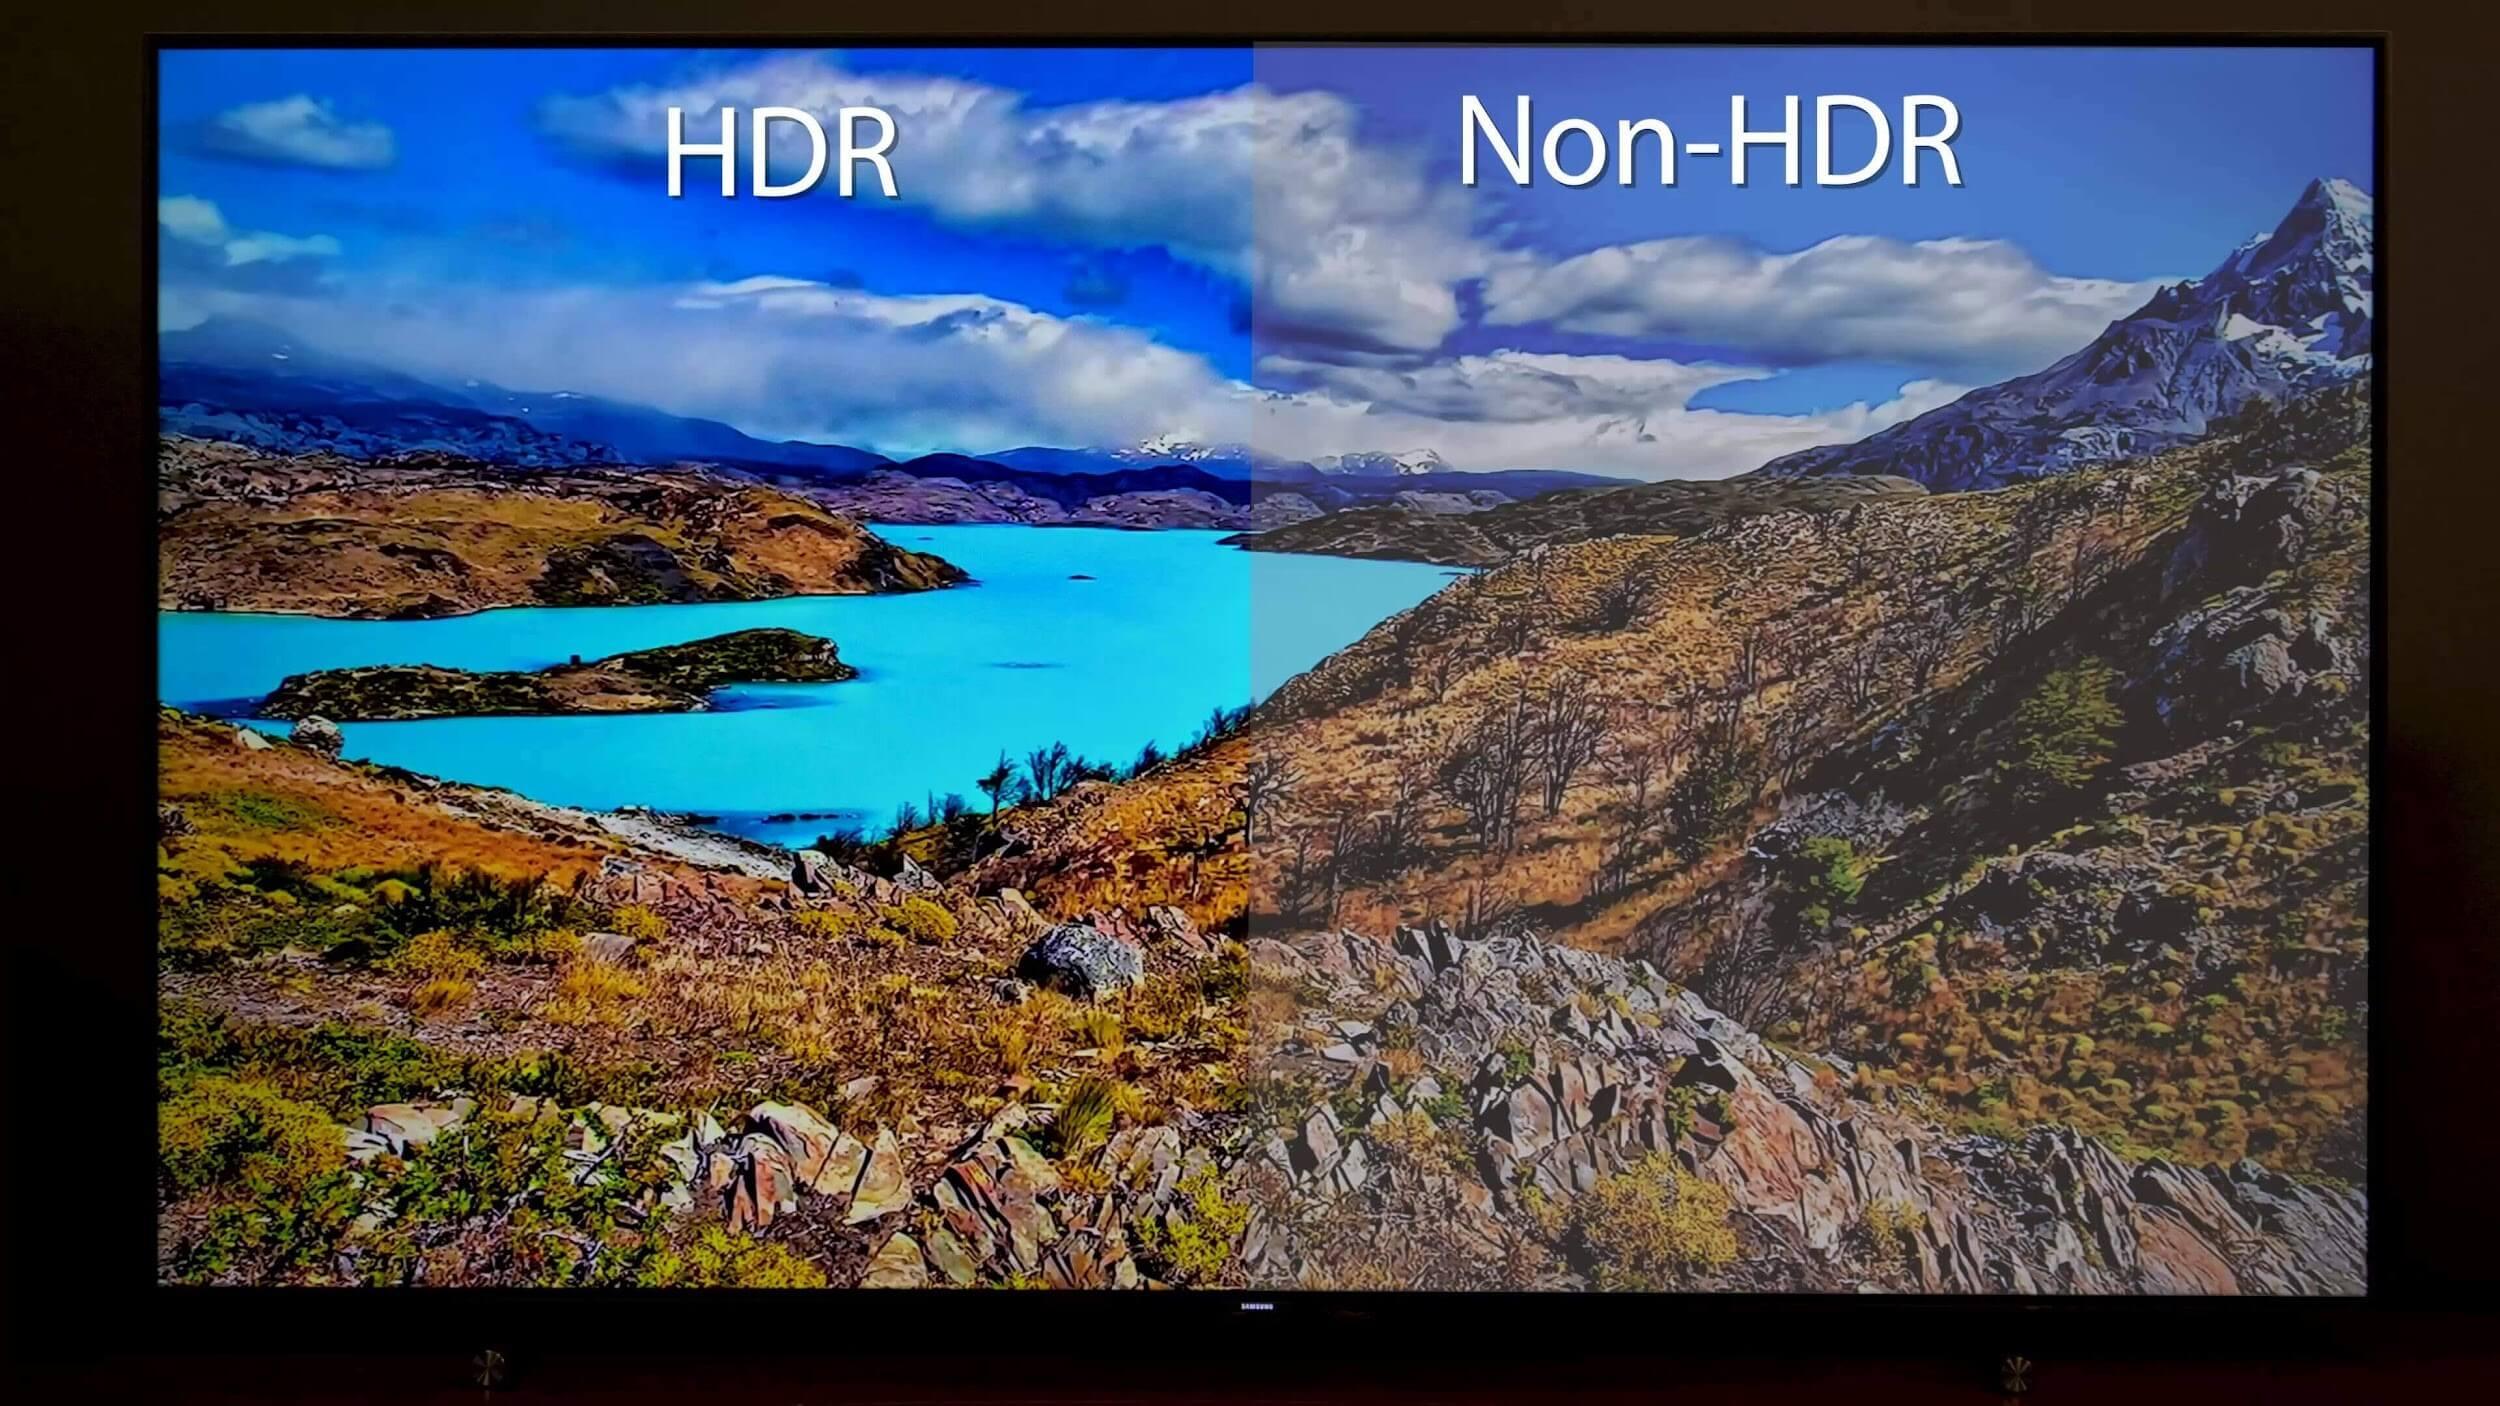 HDR vs Non HDR